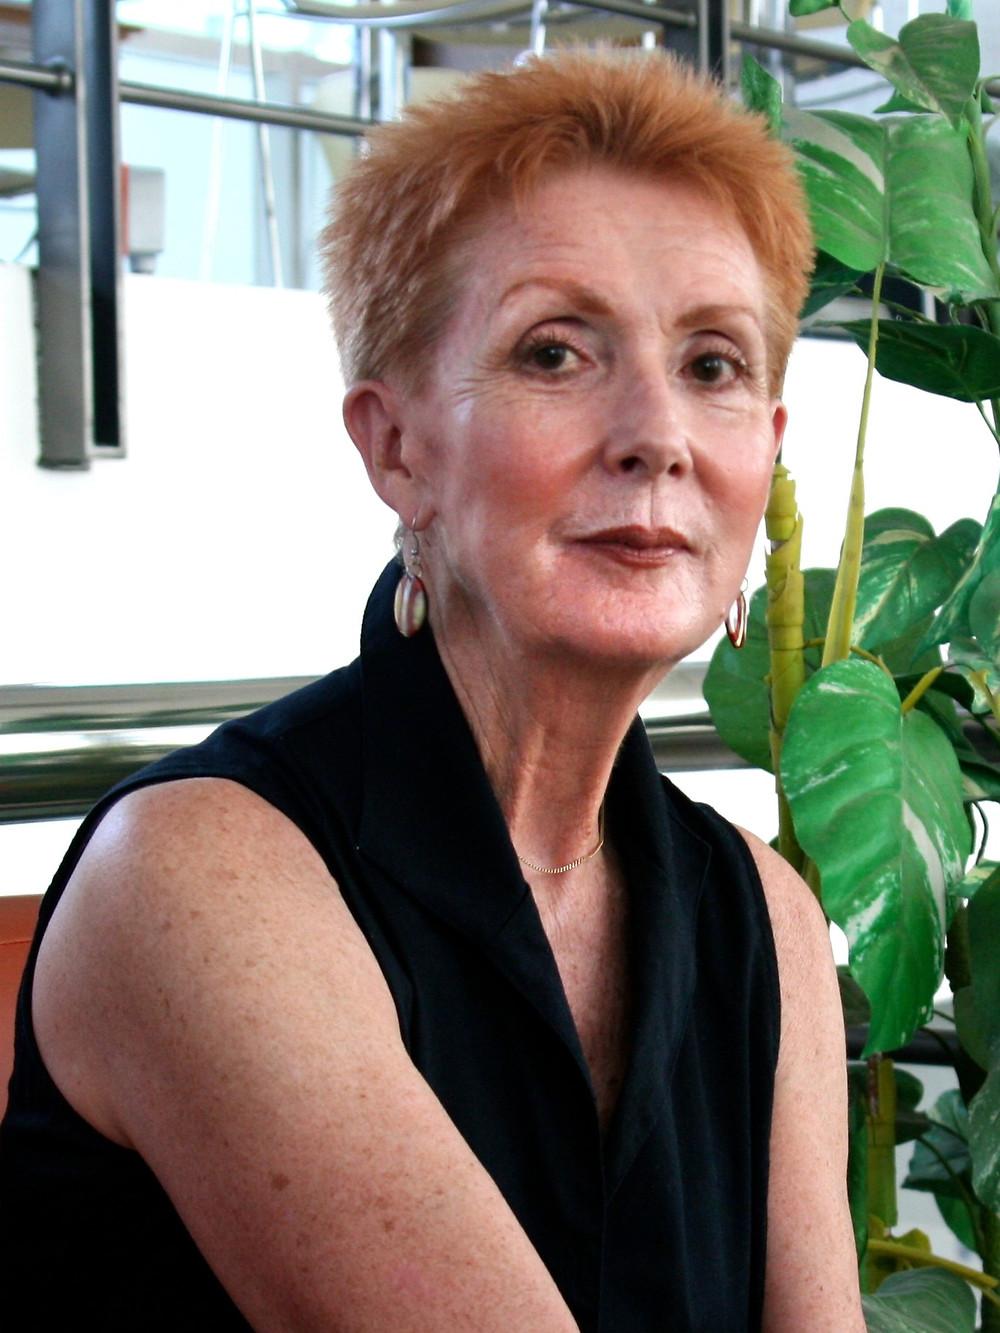 Mariela A. Gutierrez